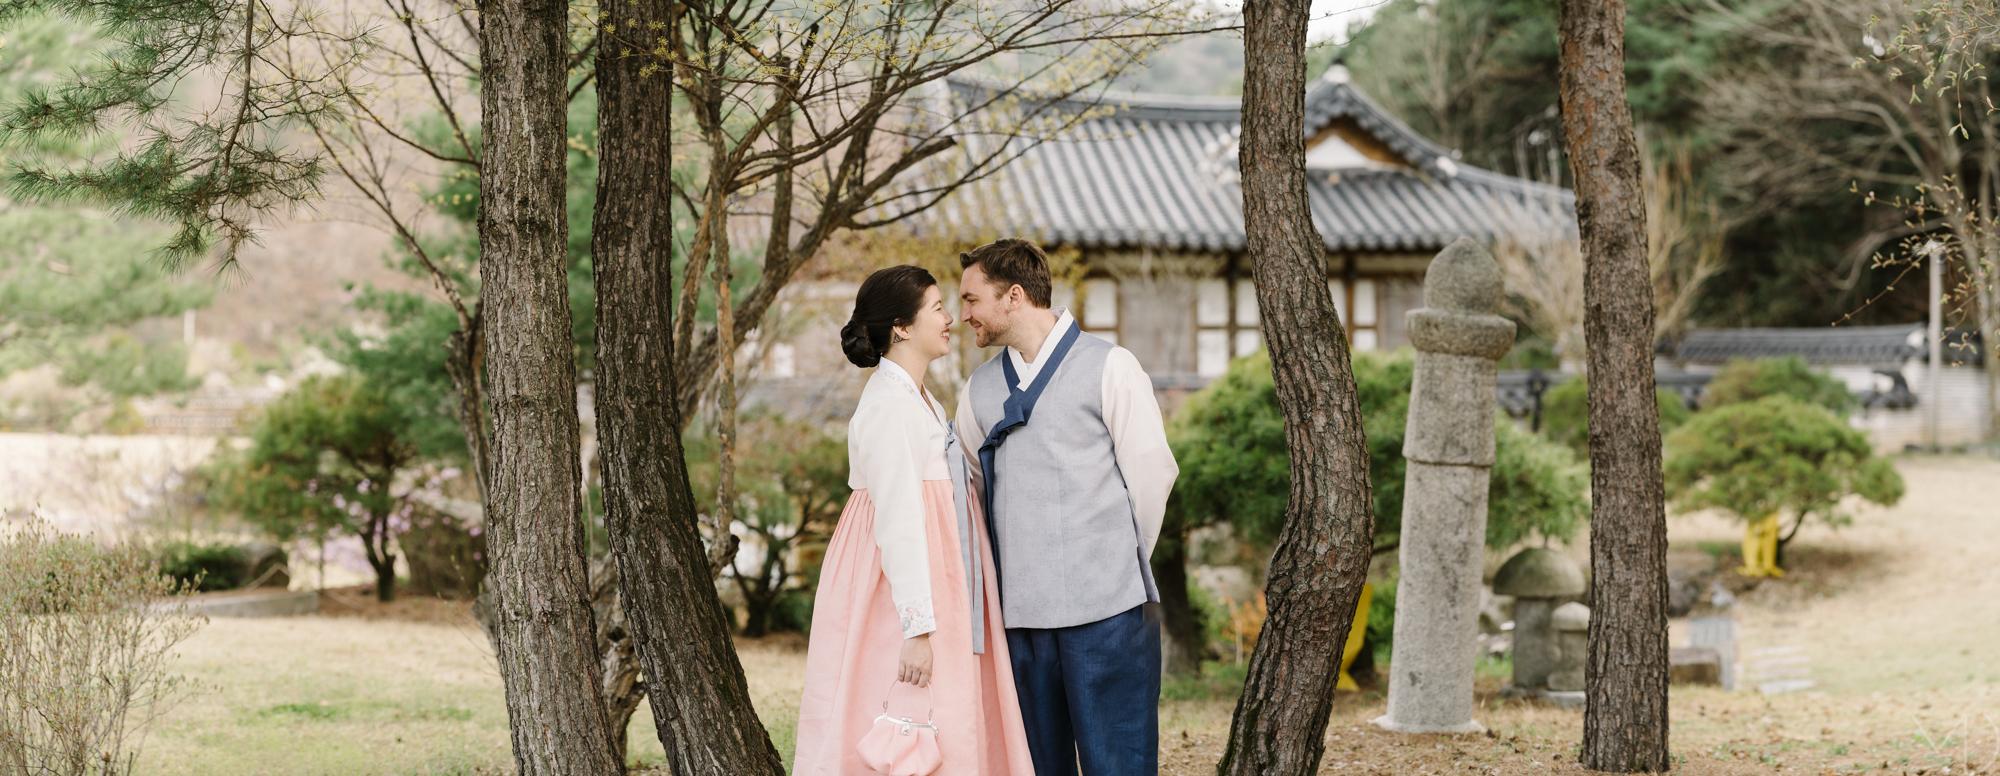 Seoul South Korea Wedding photographer (39).JPG